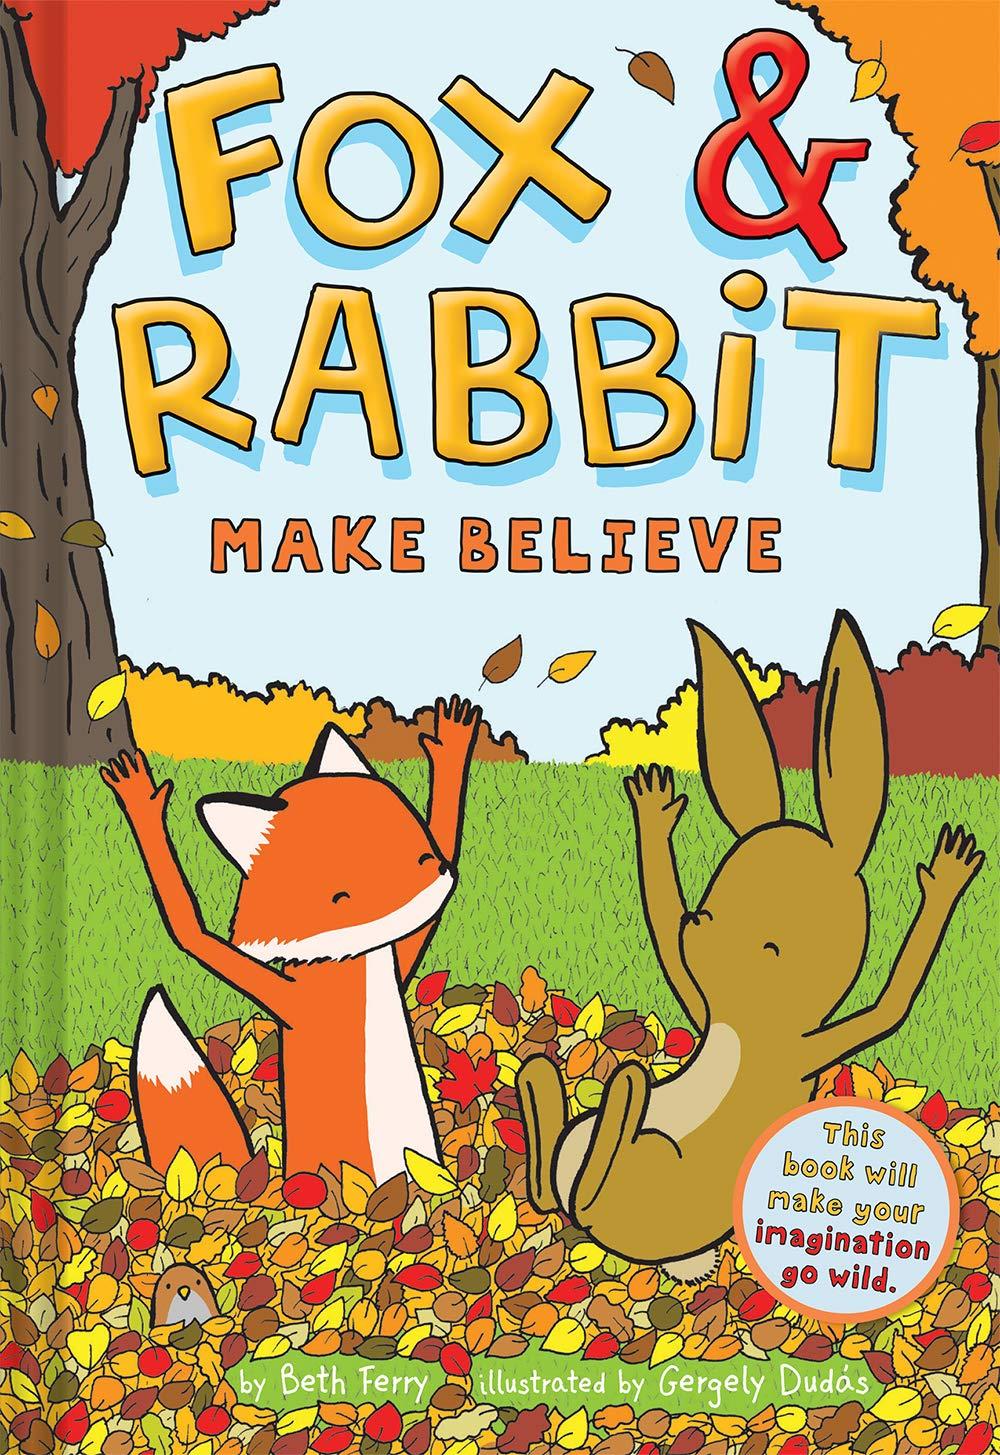 Amazon.com: Fox & Rabbit Make Believe (Fox & Rabbit Book #2 ...